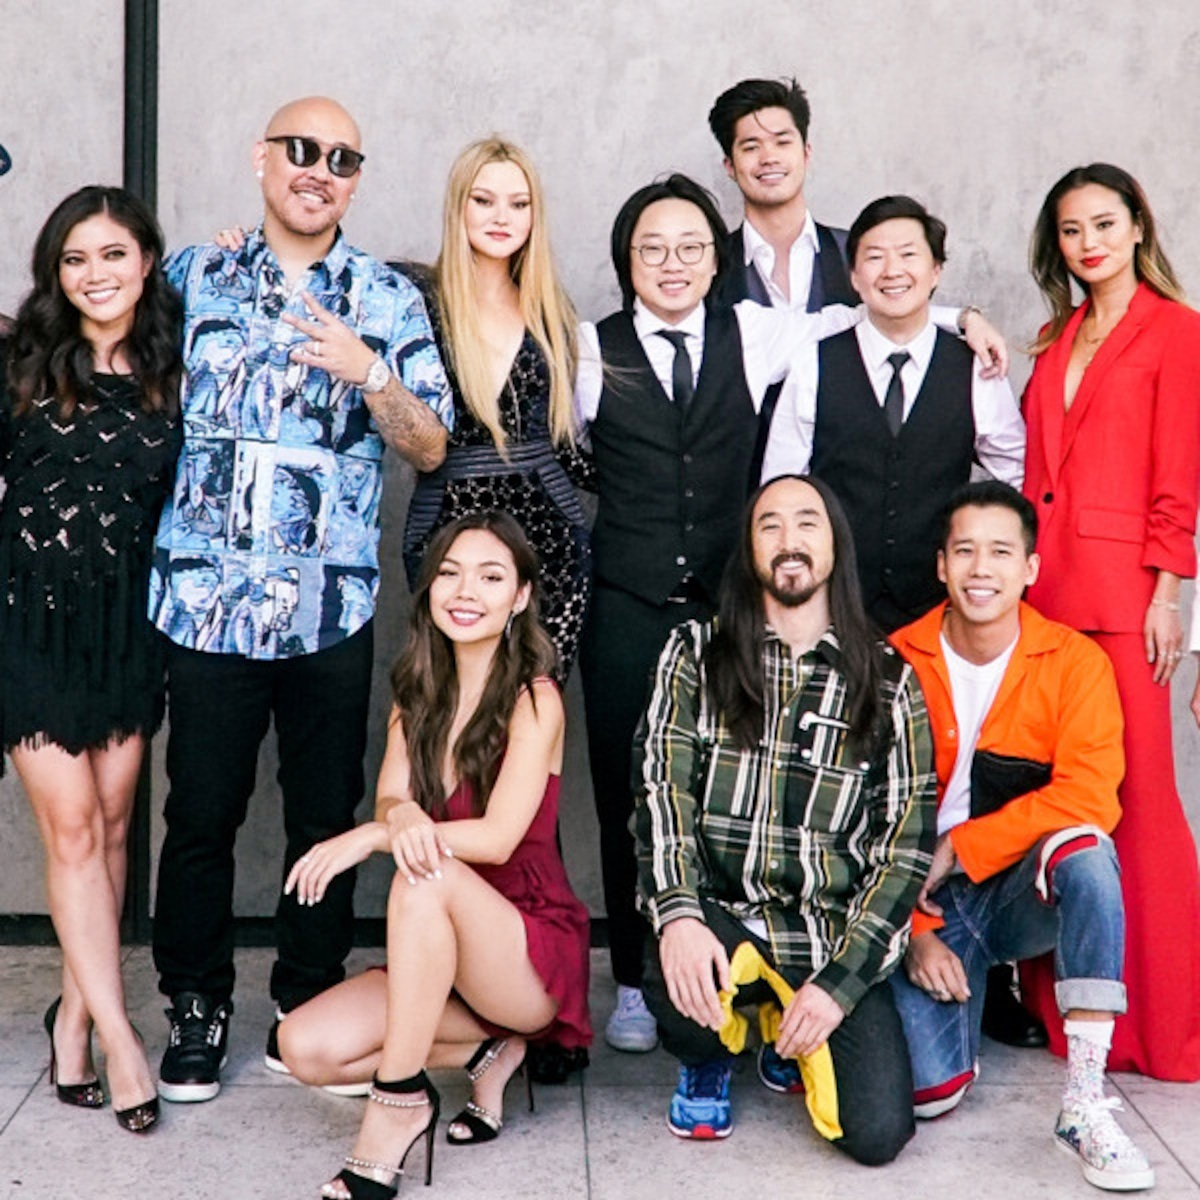 Bts Steve Aoki S Waste It On Me Stars An All Asian American